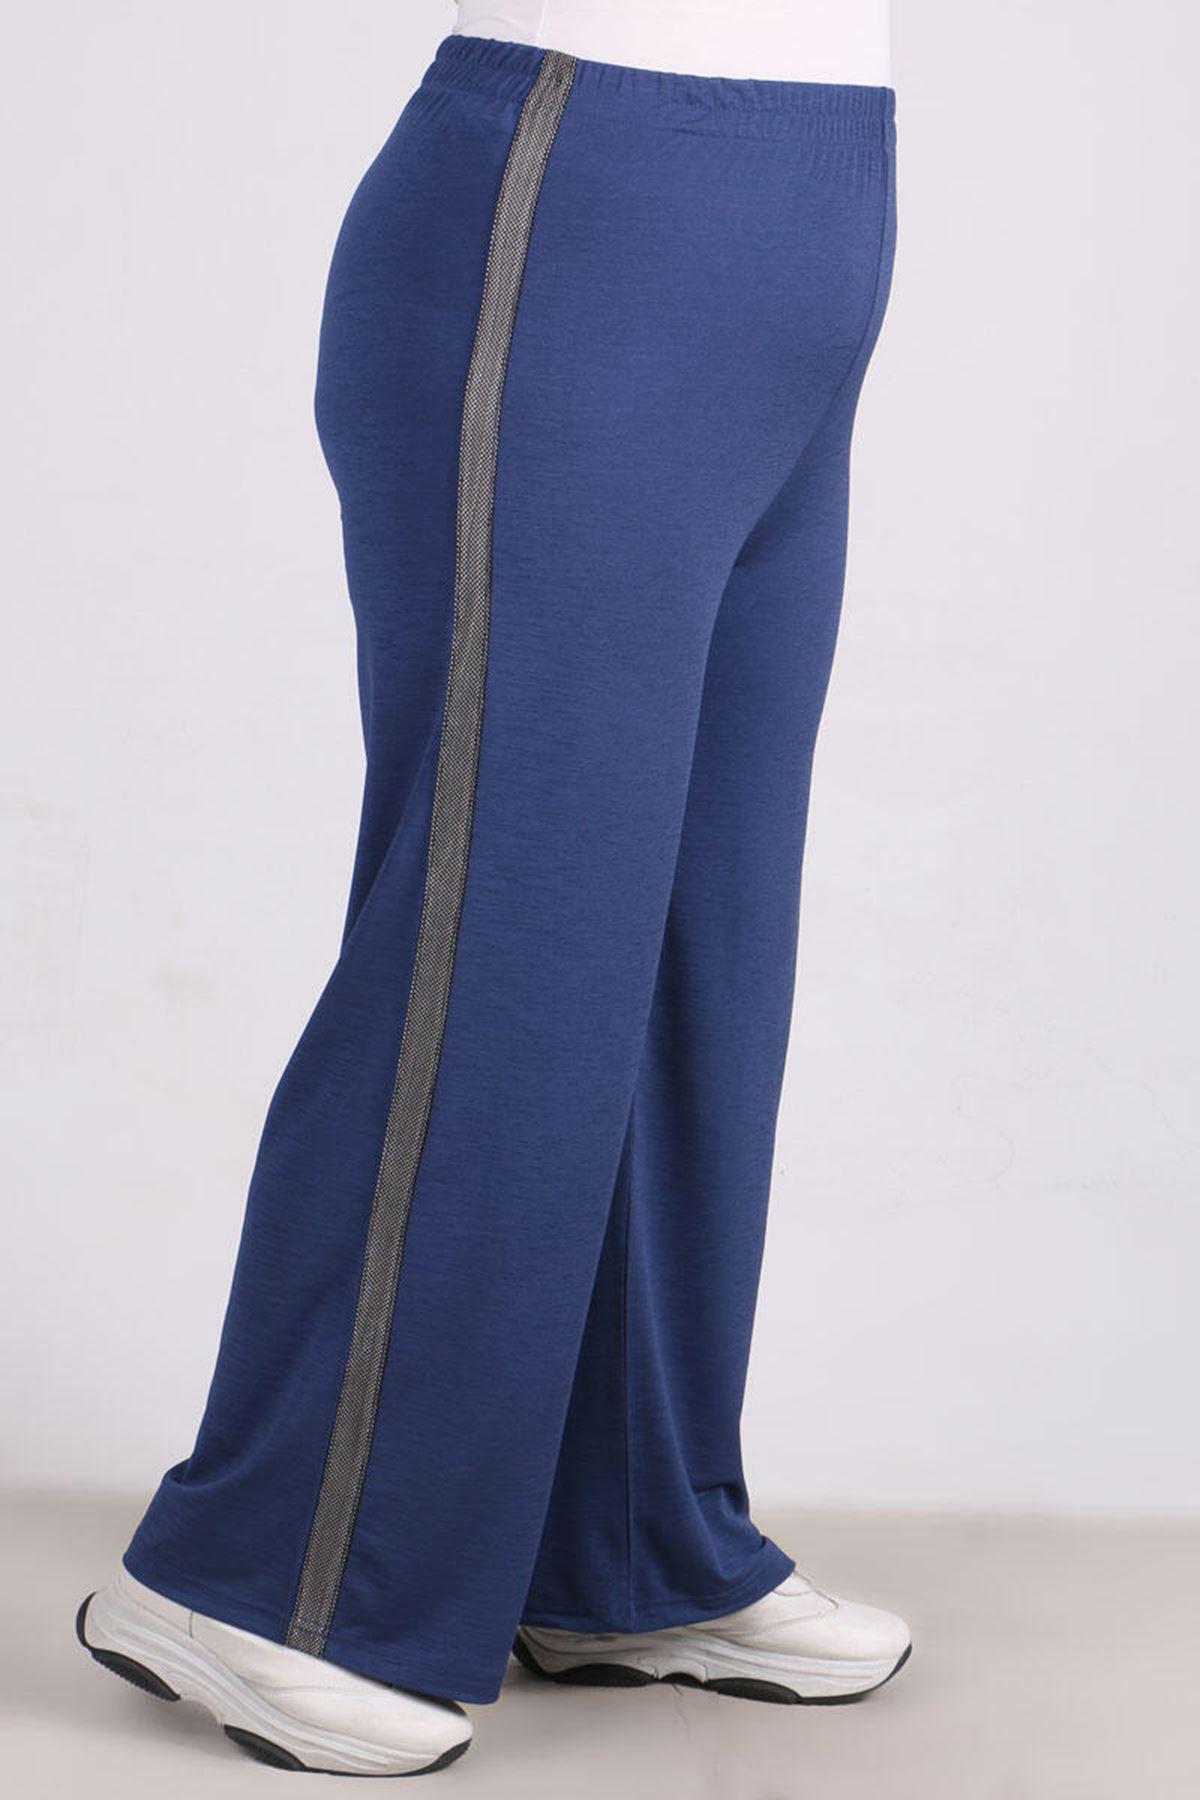 9141 Plus Size Pants - Indigo